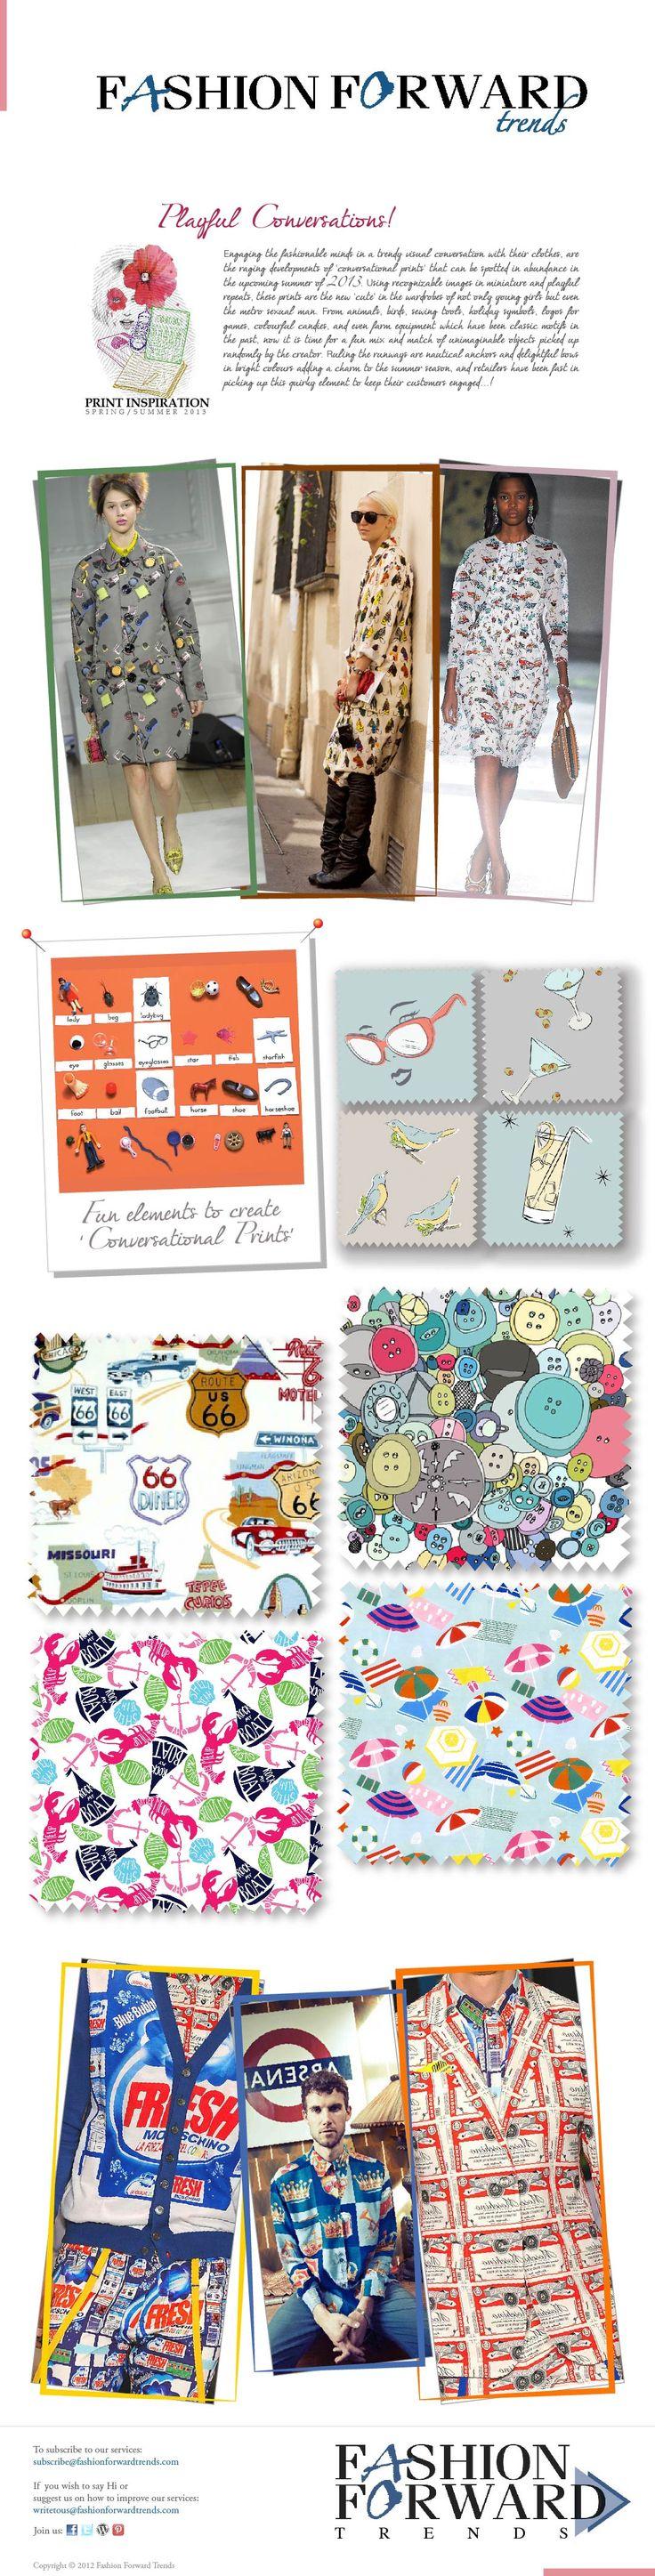 Print Inspirations- Playful Conversations